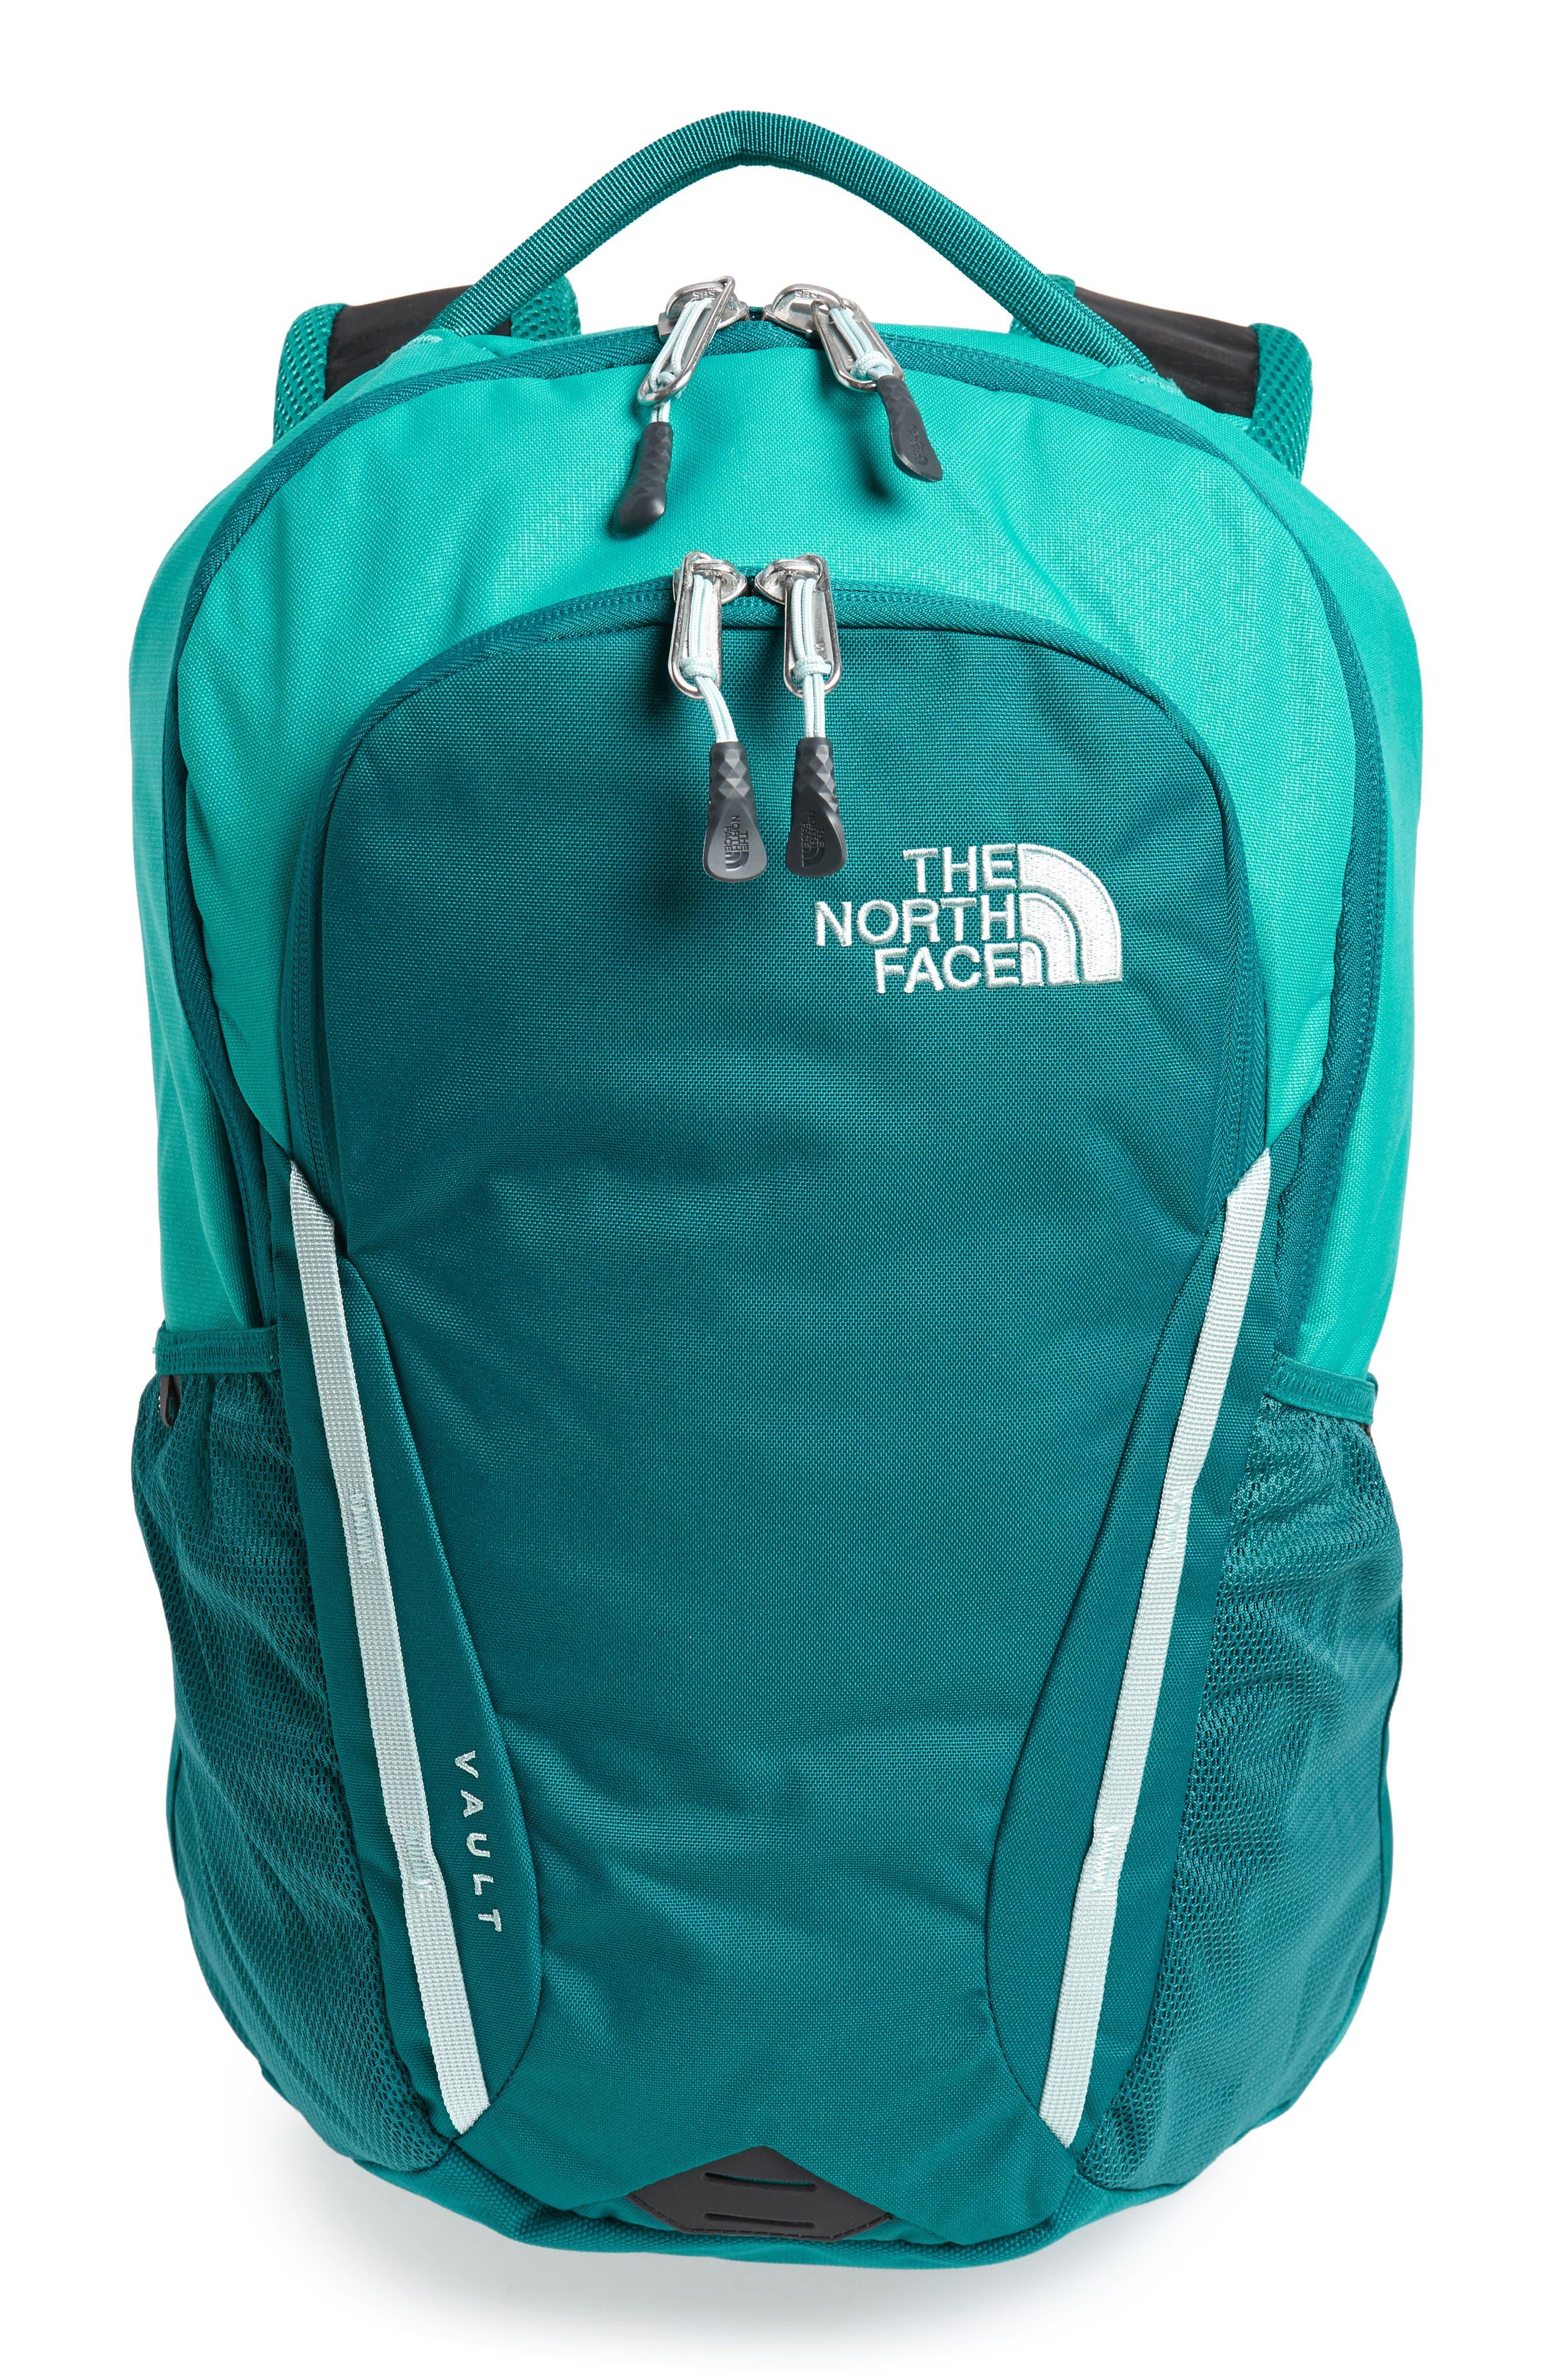 Vault Backpack,                         Main,                         color, Kokomo Green/ Everglade